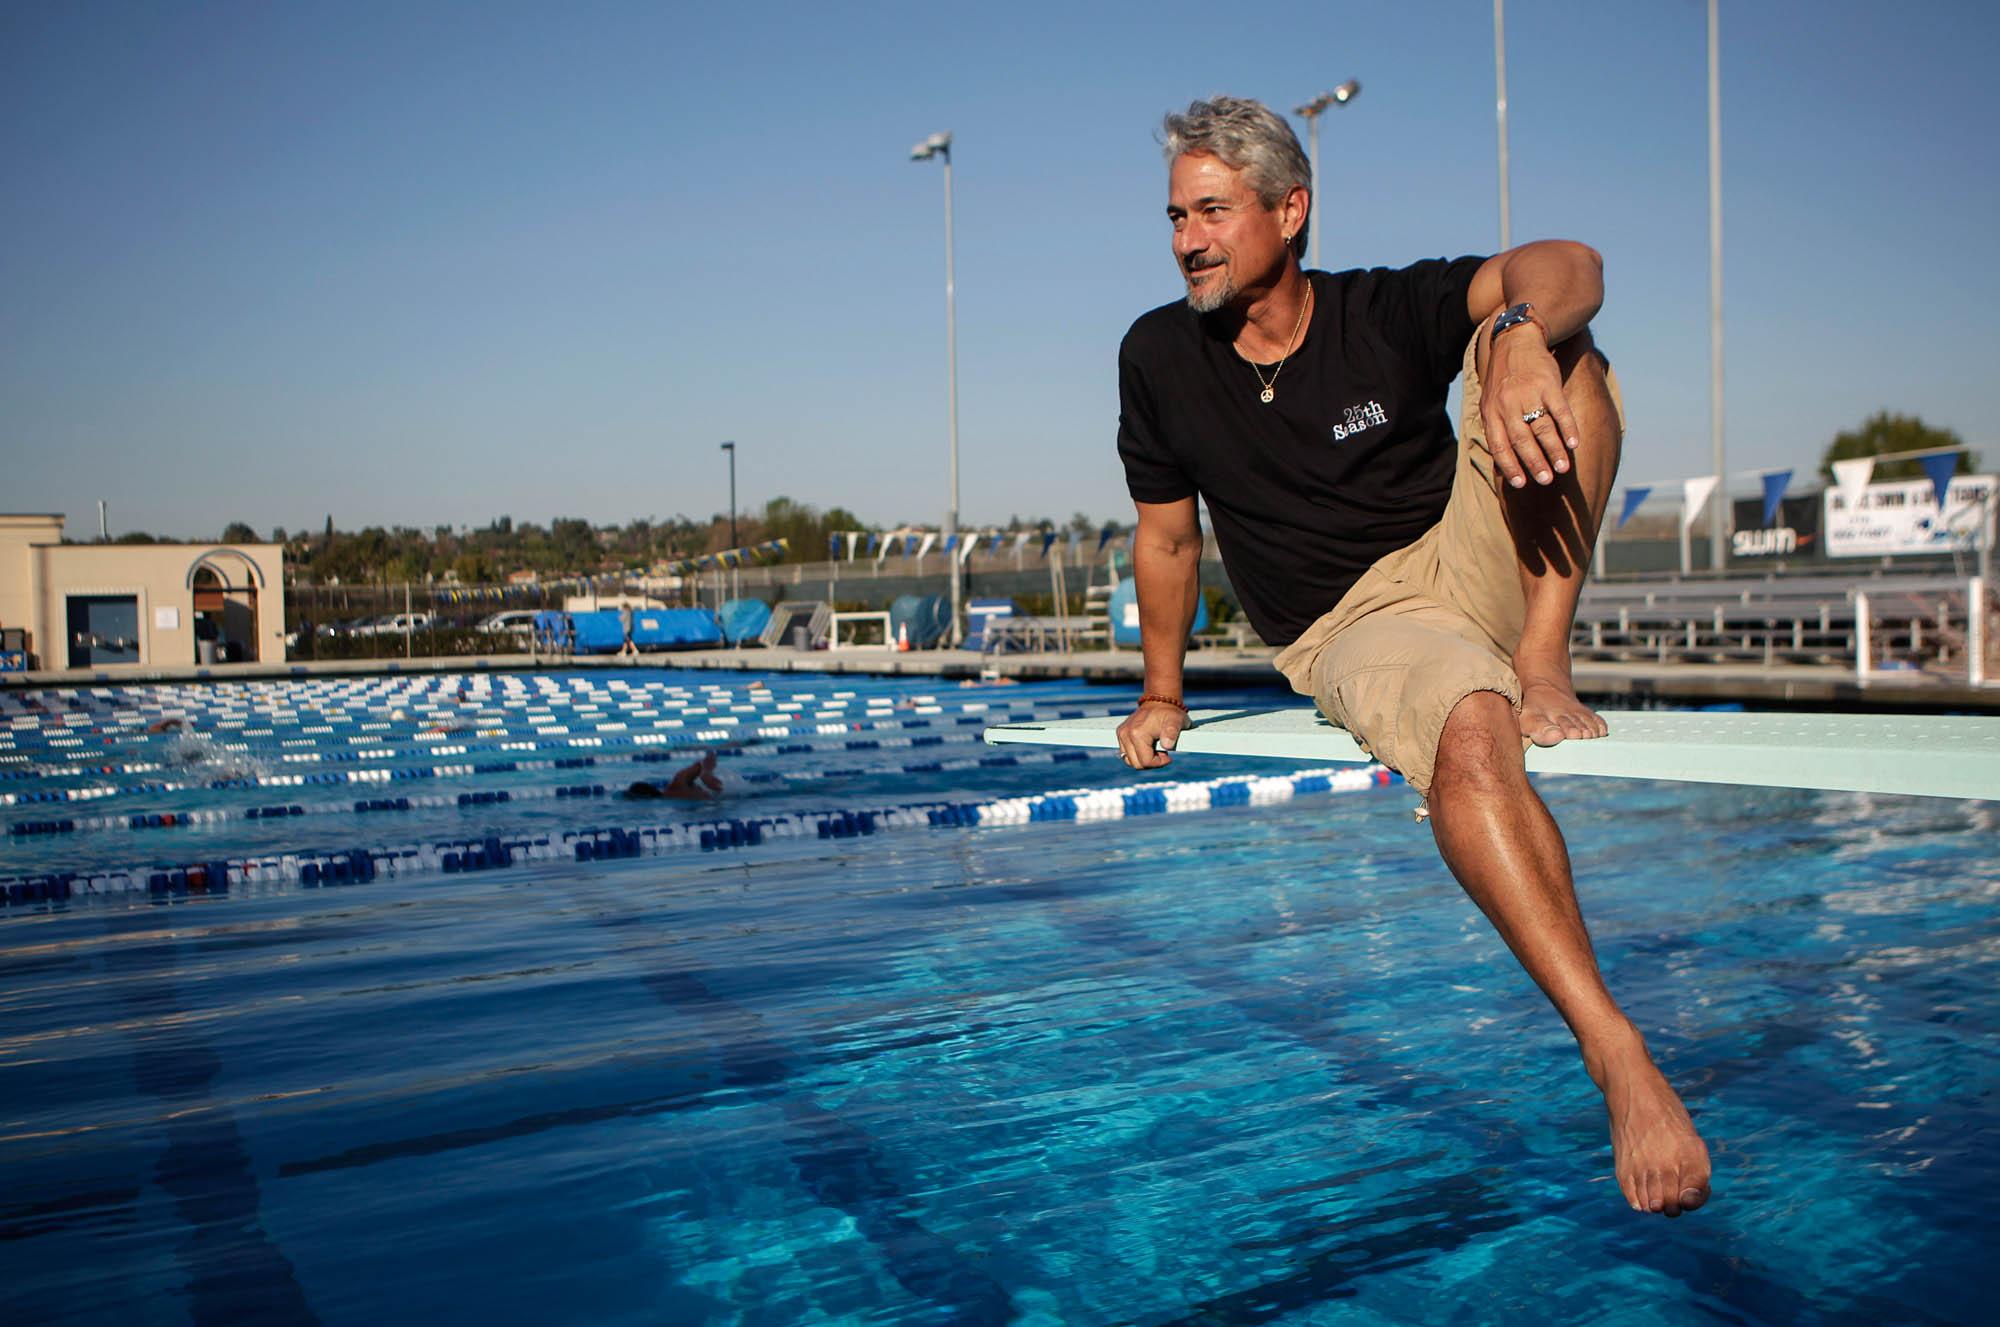 Greg Louganis sitting on pool diving board (© AP Images)